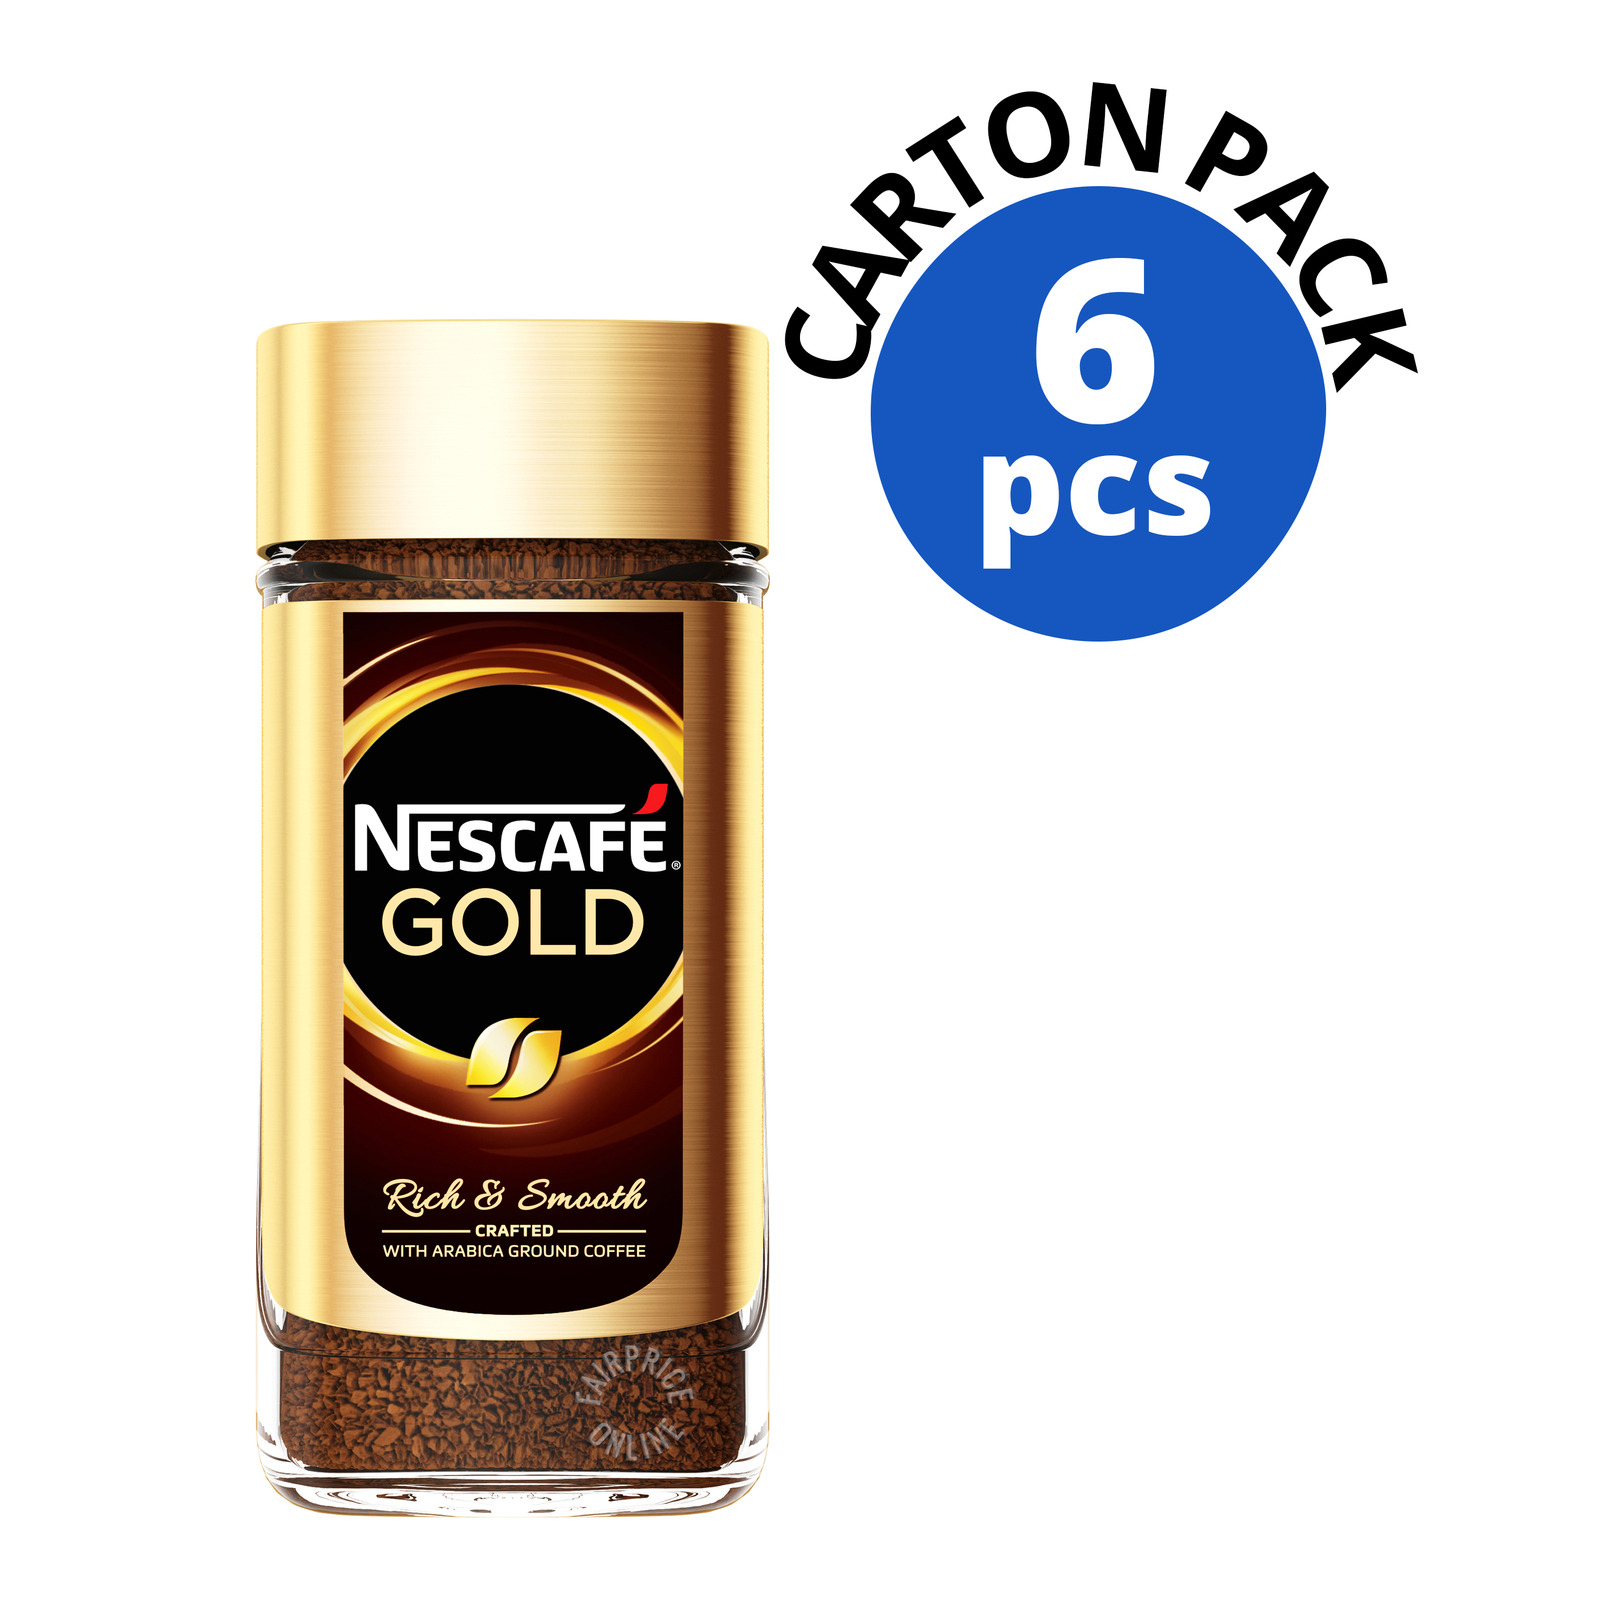 Nescafe Gold Instant Arabica Ground Coffee-Rich&Smooth